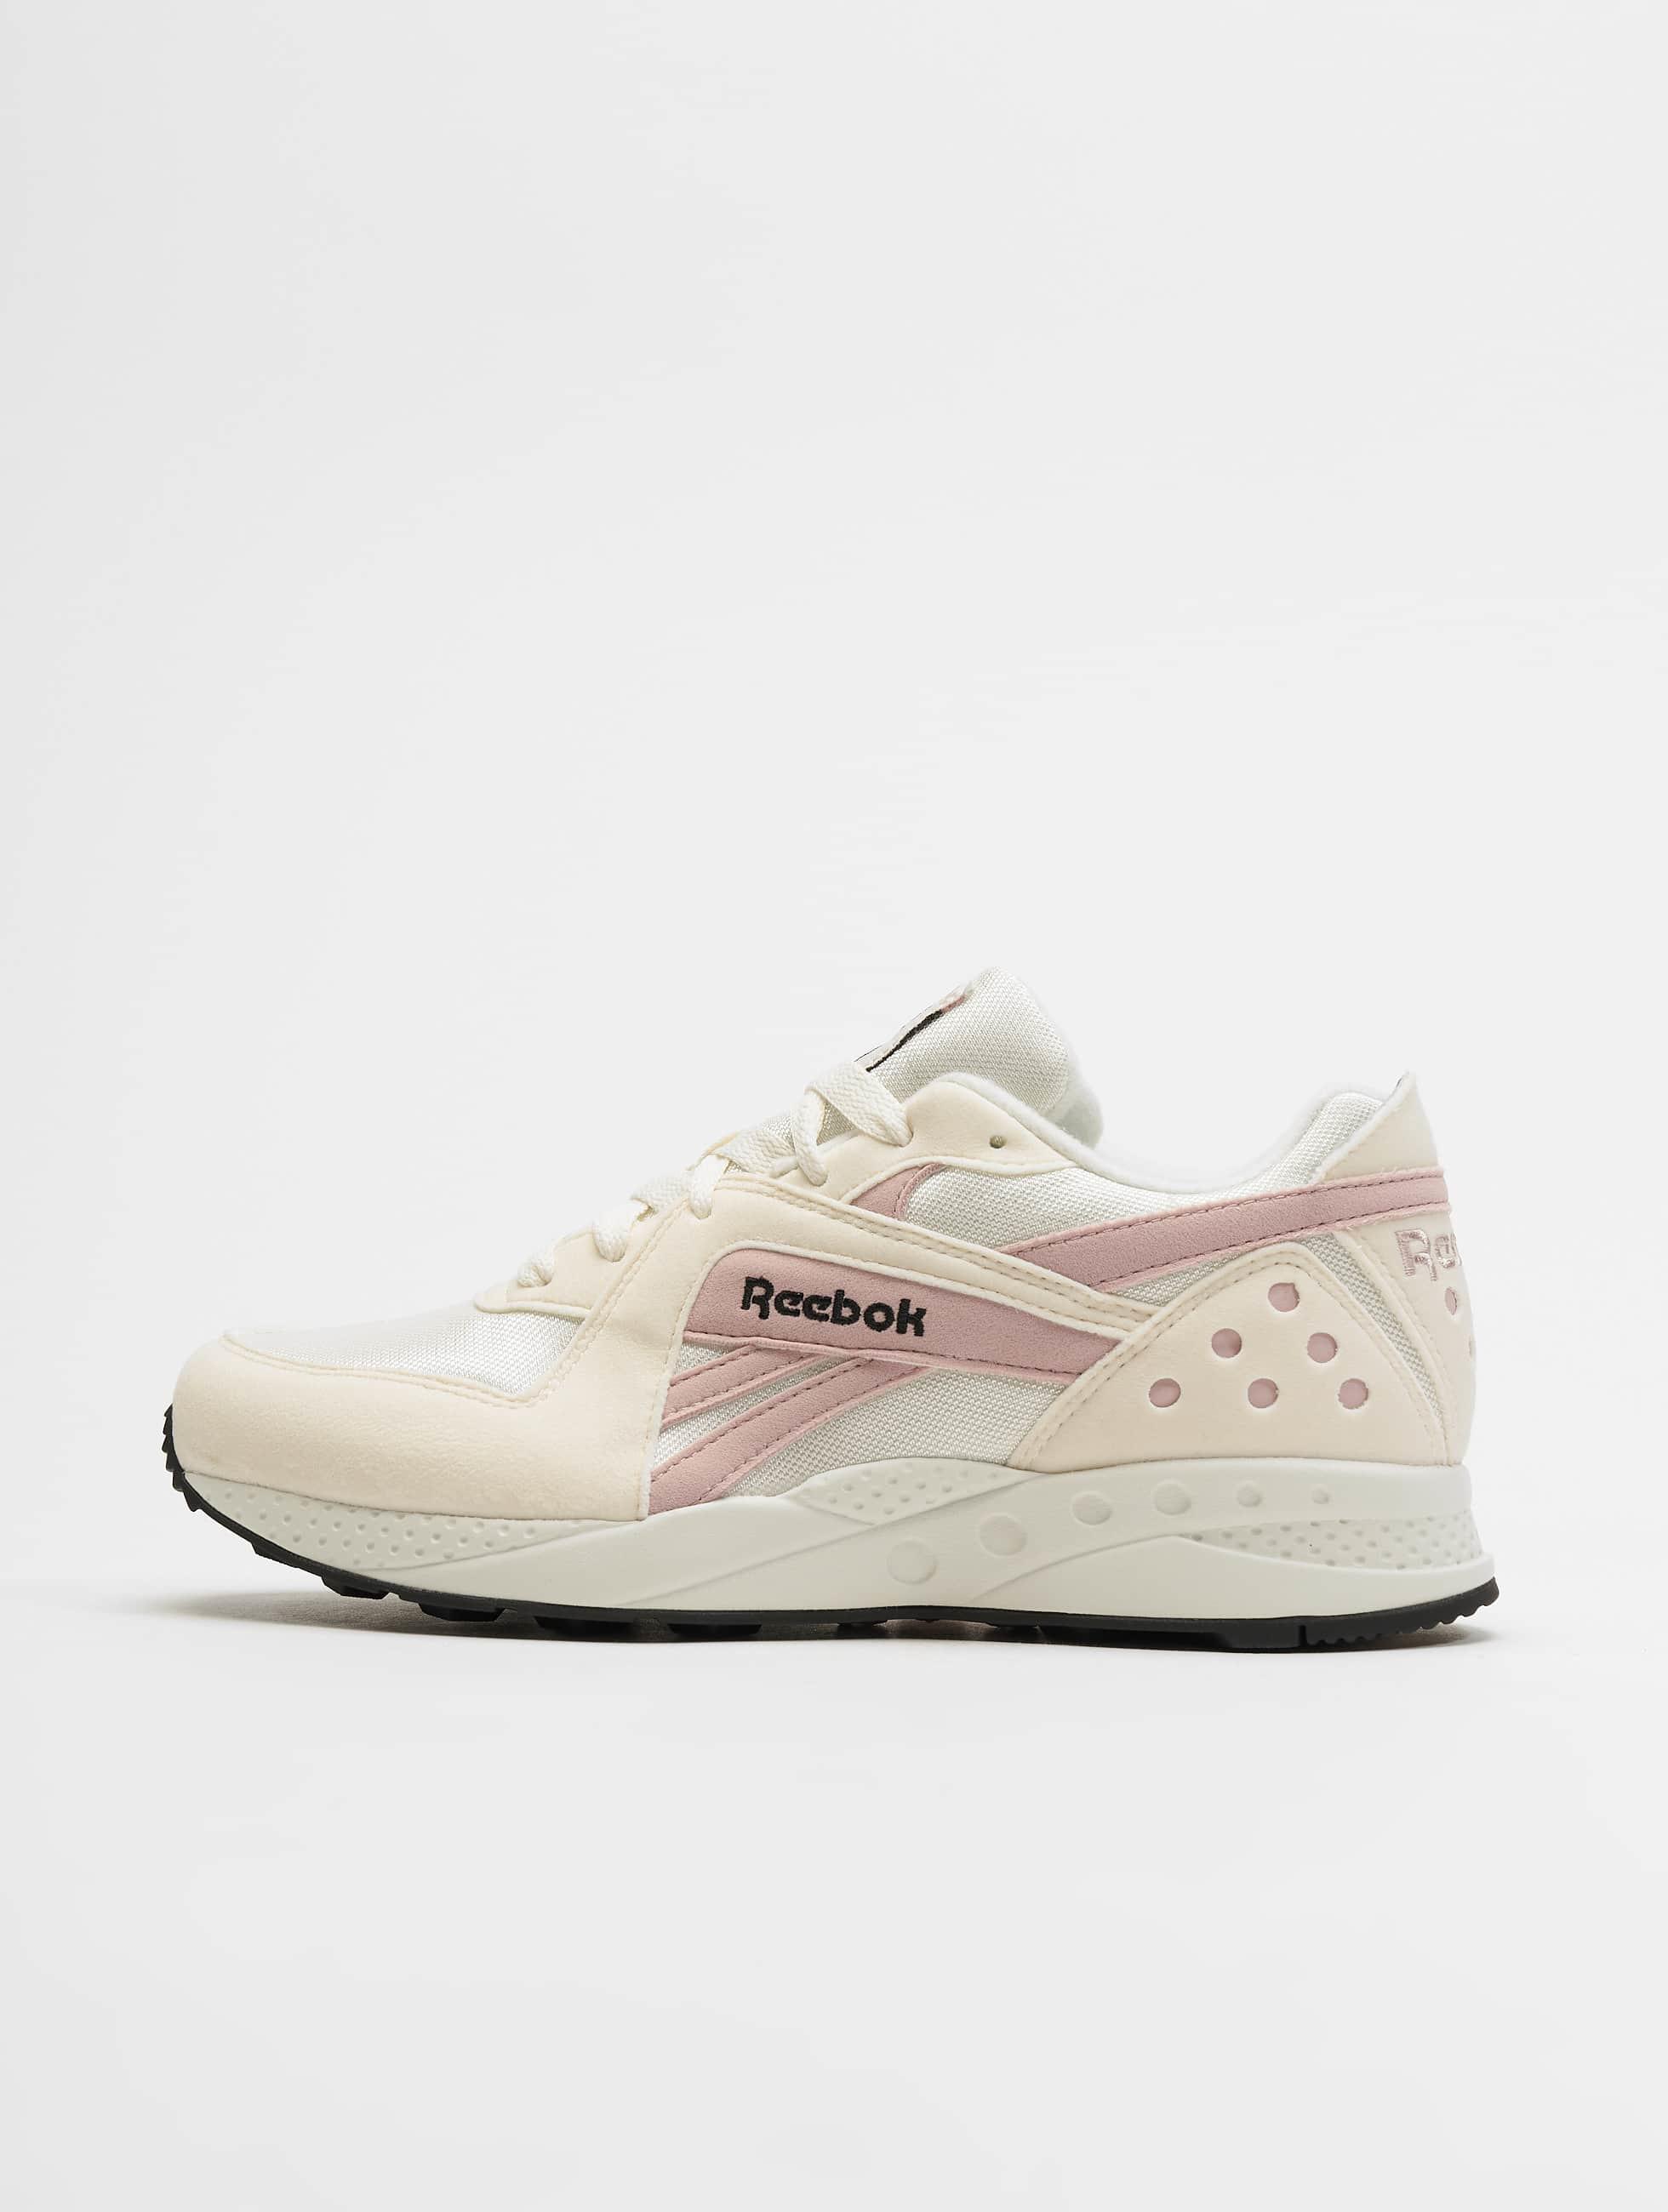 Reebok Pyro Sneakers PorcelainLight Sand